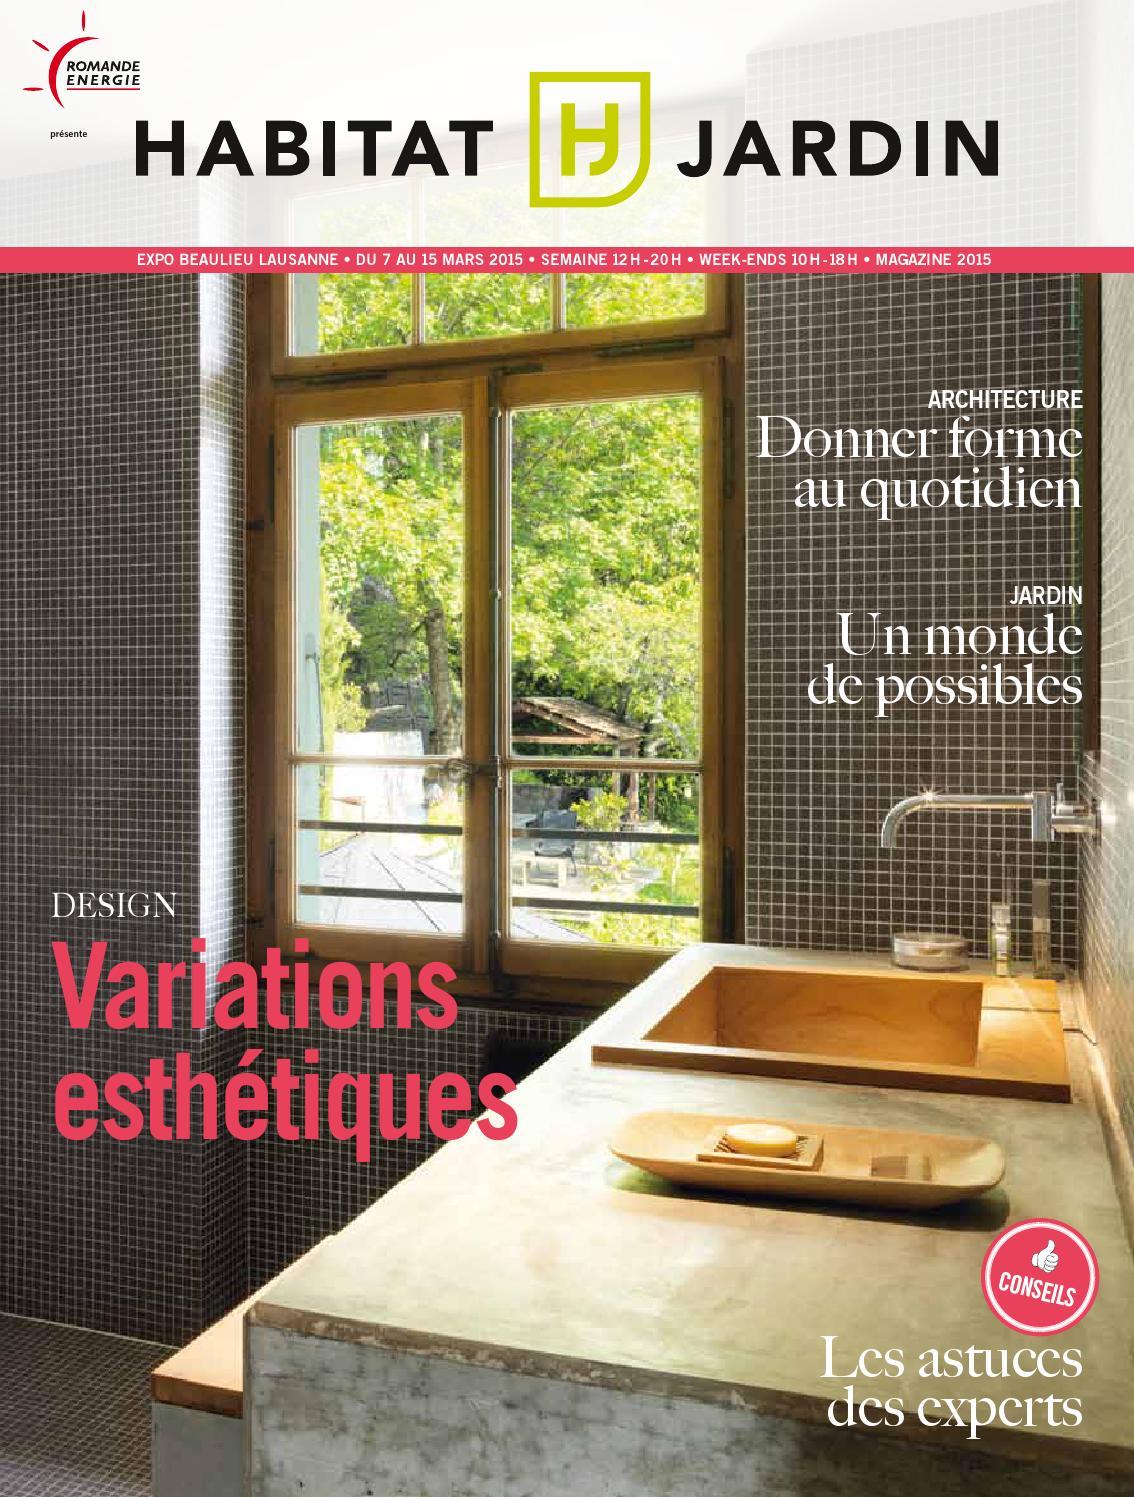 habitat jardin 2015 magazine by in dit publications sa issuu. Black Bedroom Furniture Sets. Home Design Ideas